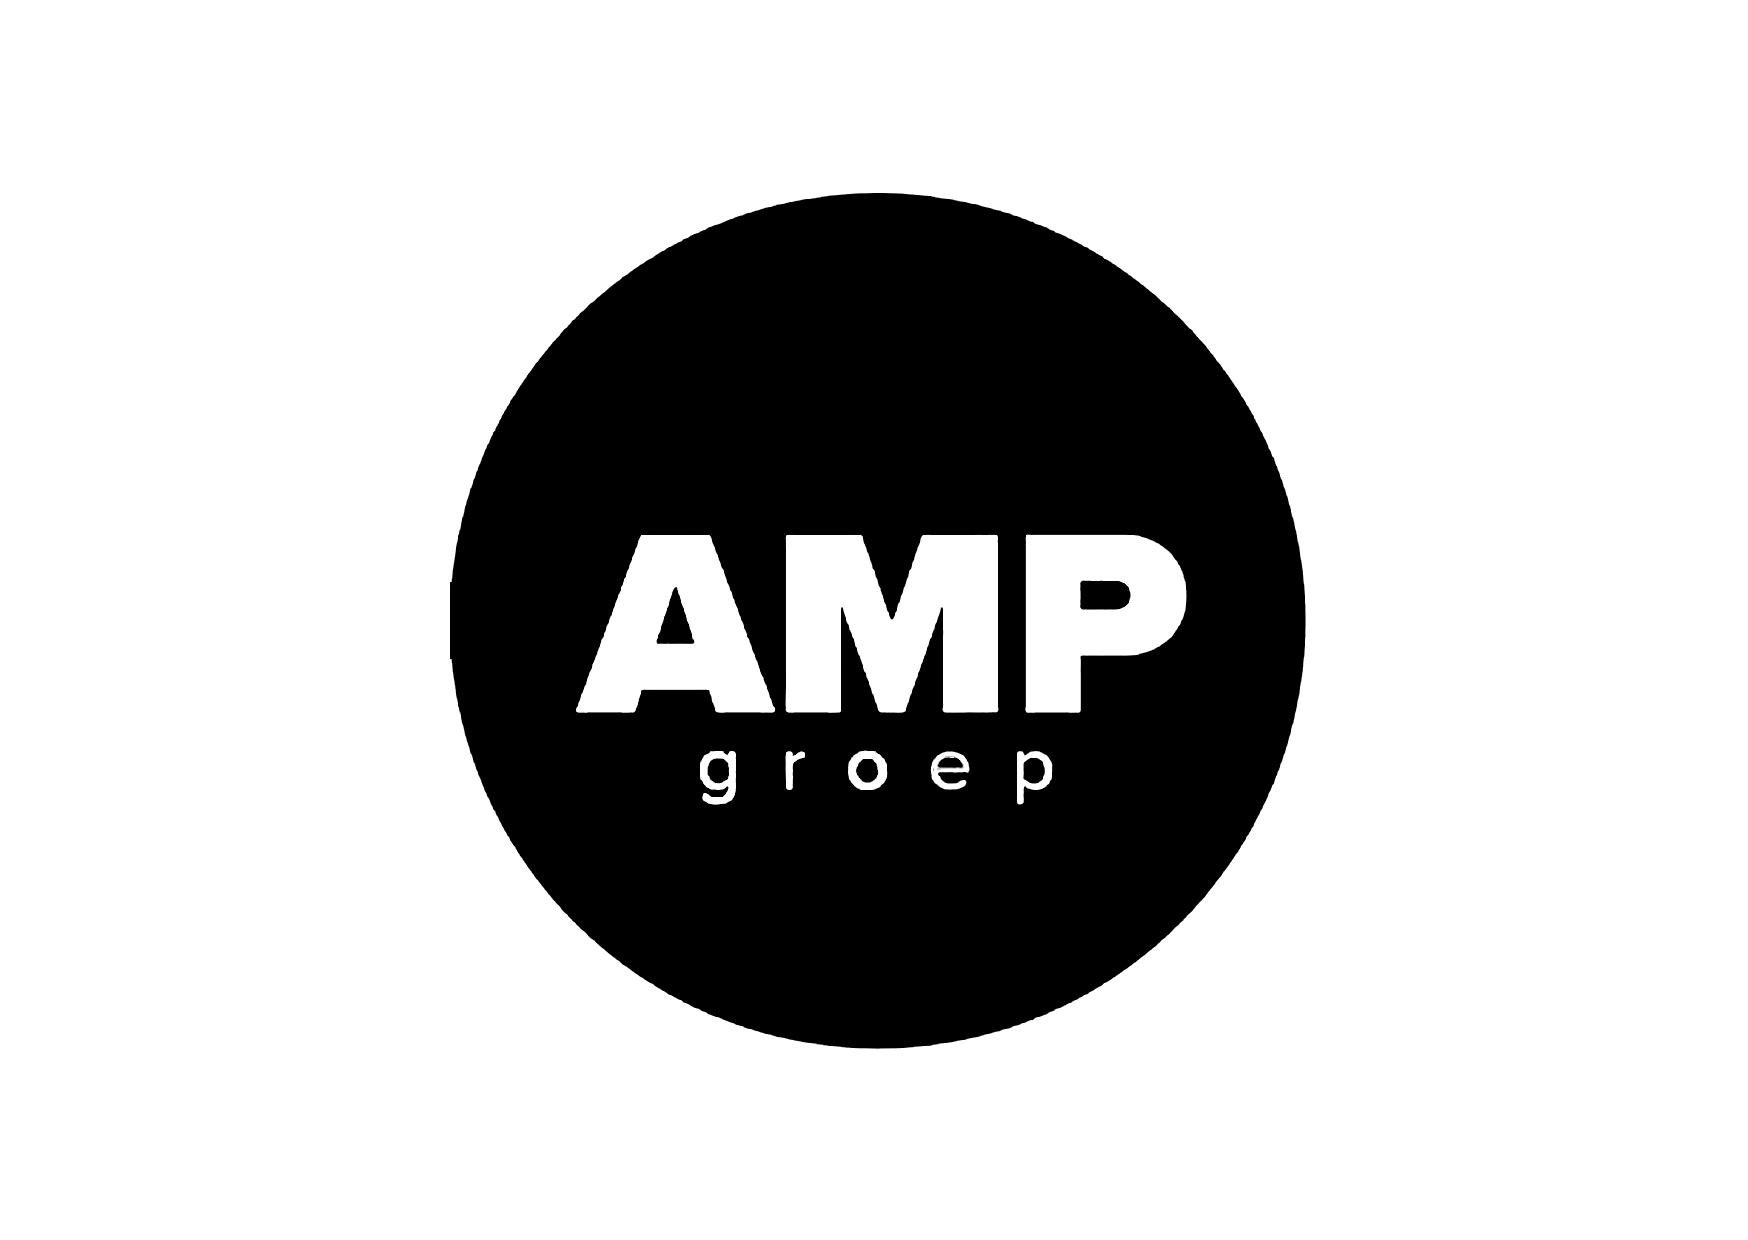 logo amp groep